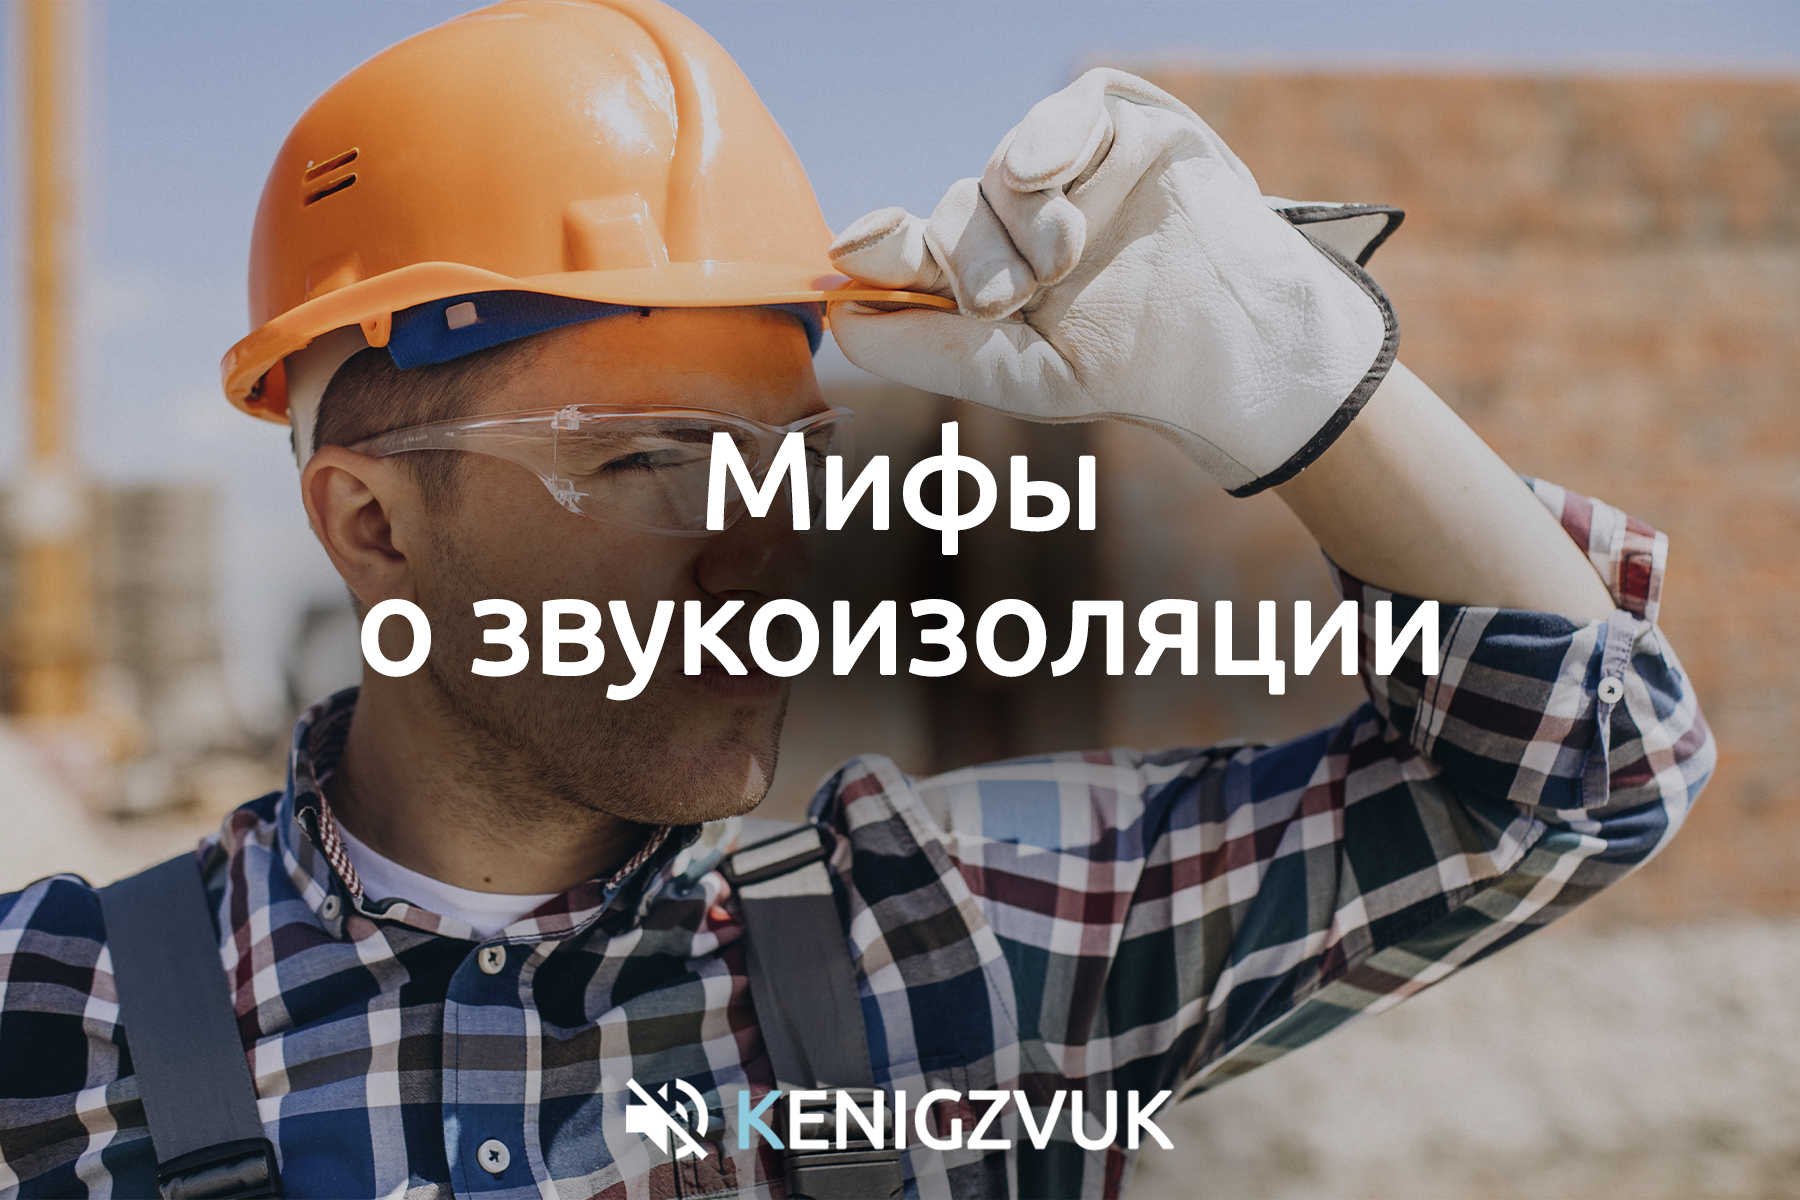 KenigZvuk | Звукоизоляция Калининград - Мифы о звукоизоляции